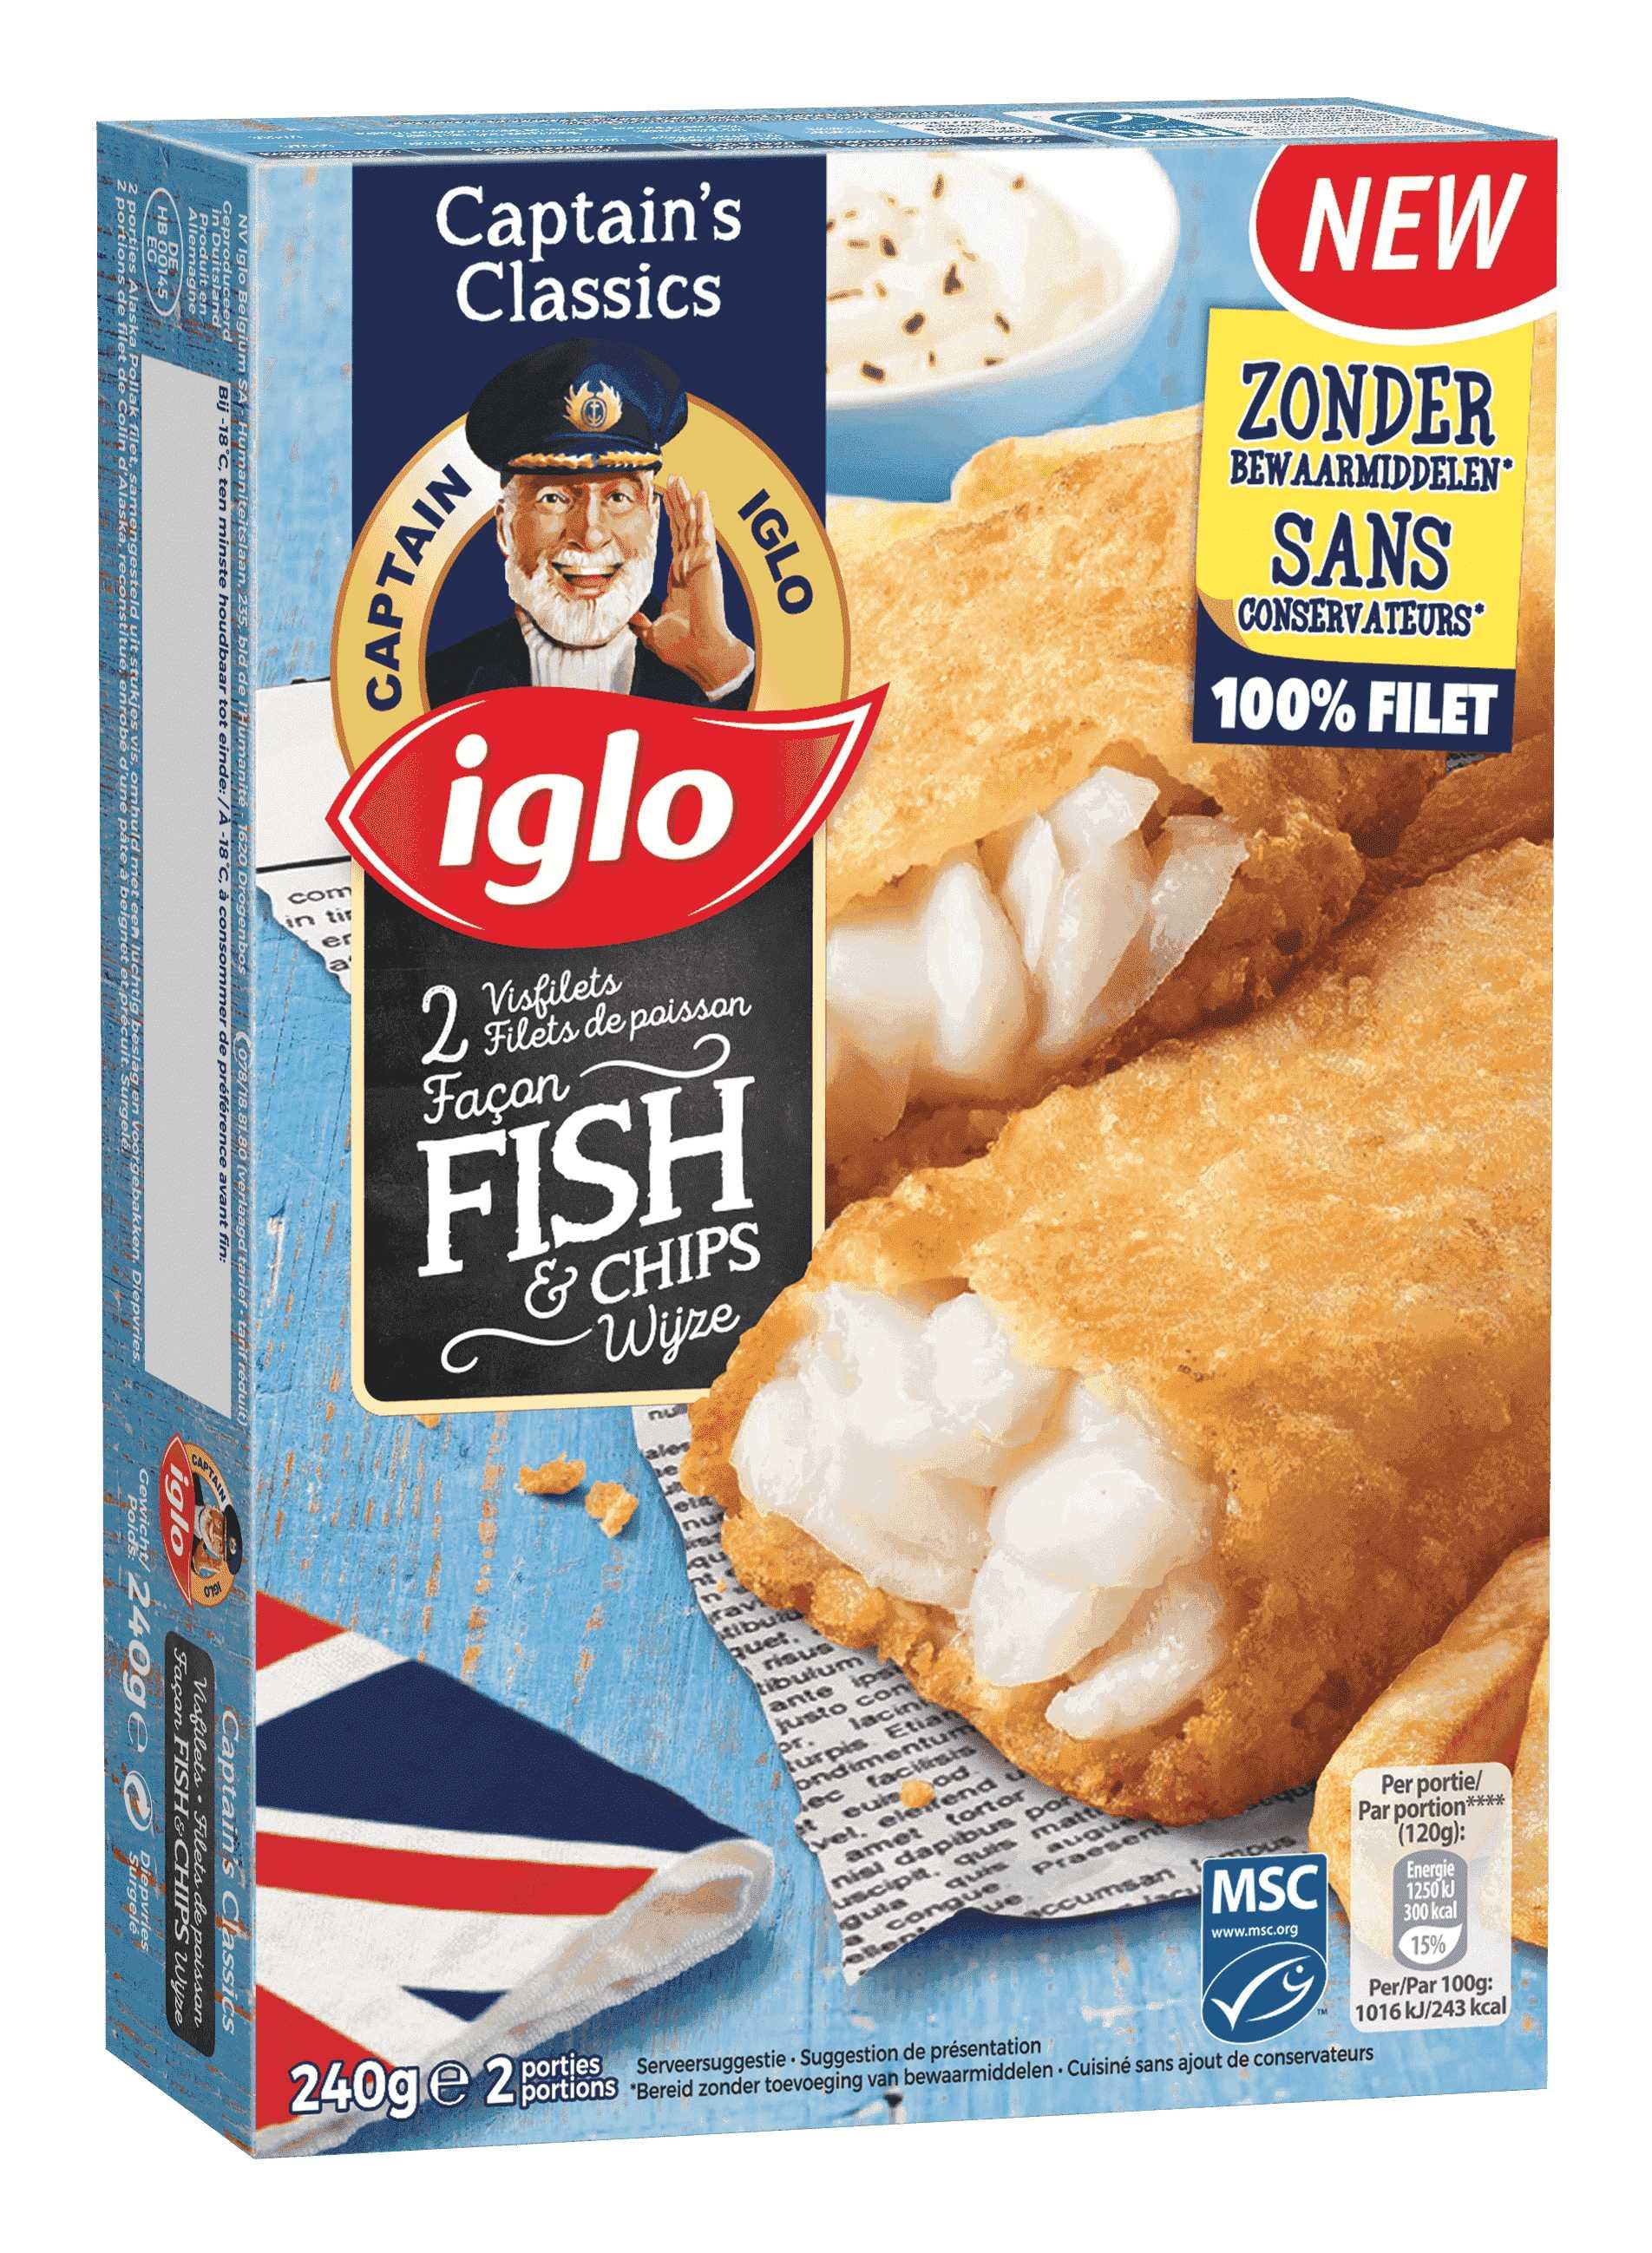 Fish Filet façon Fish & Chips